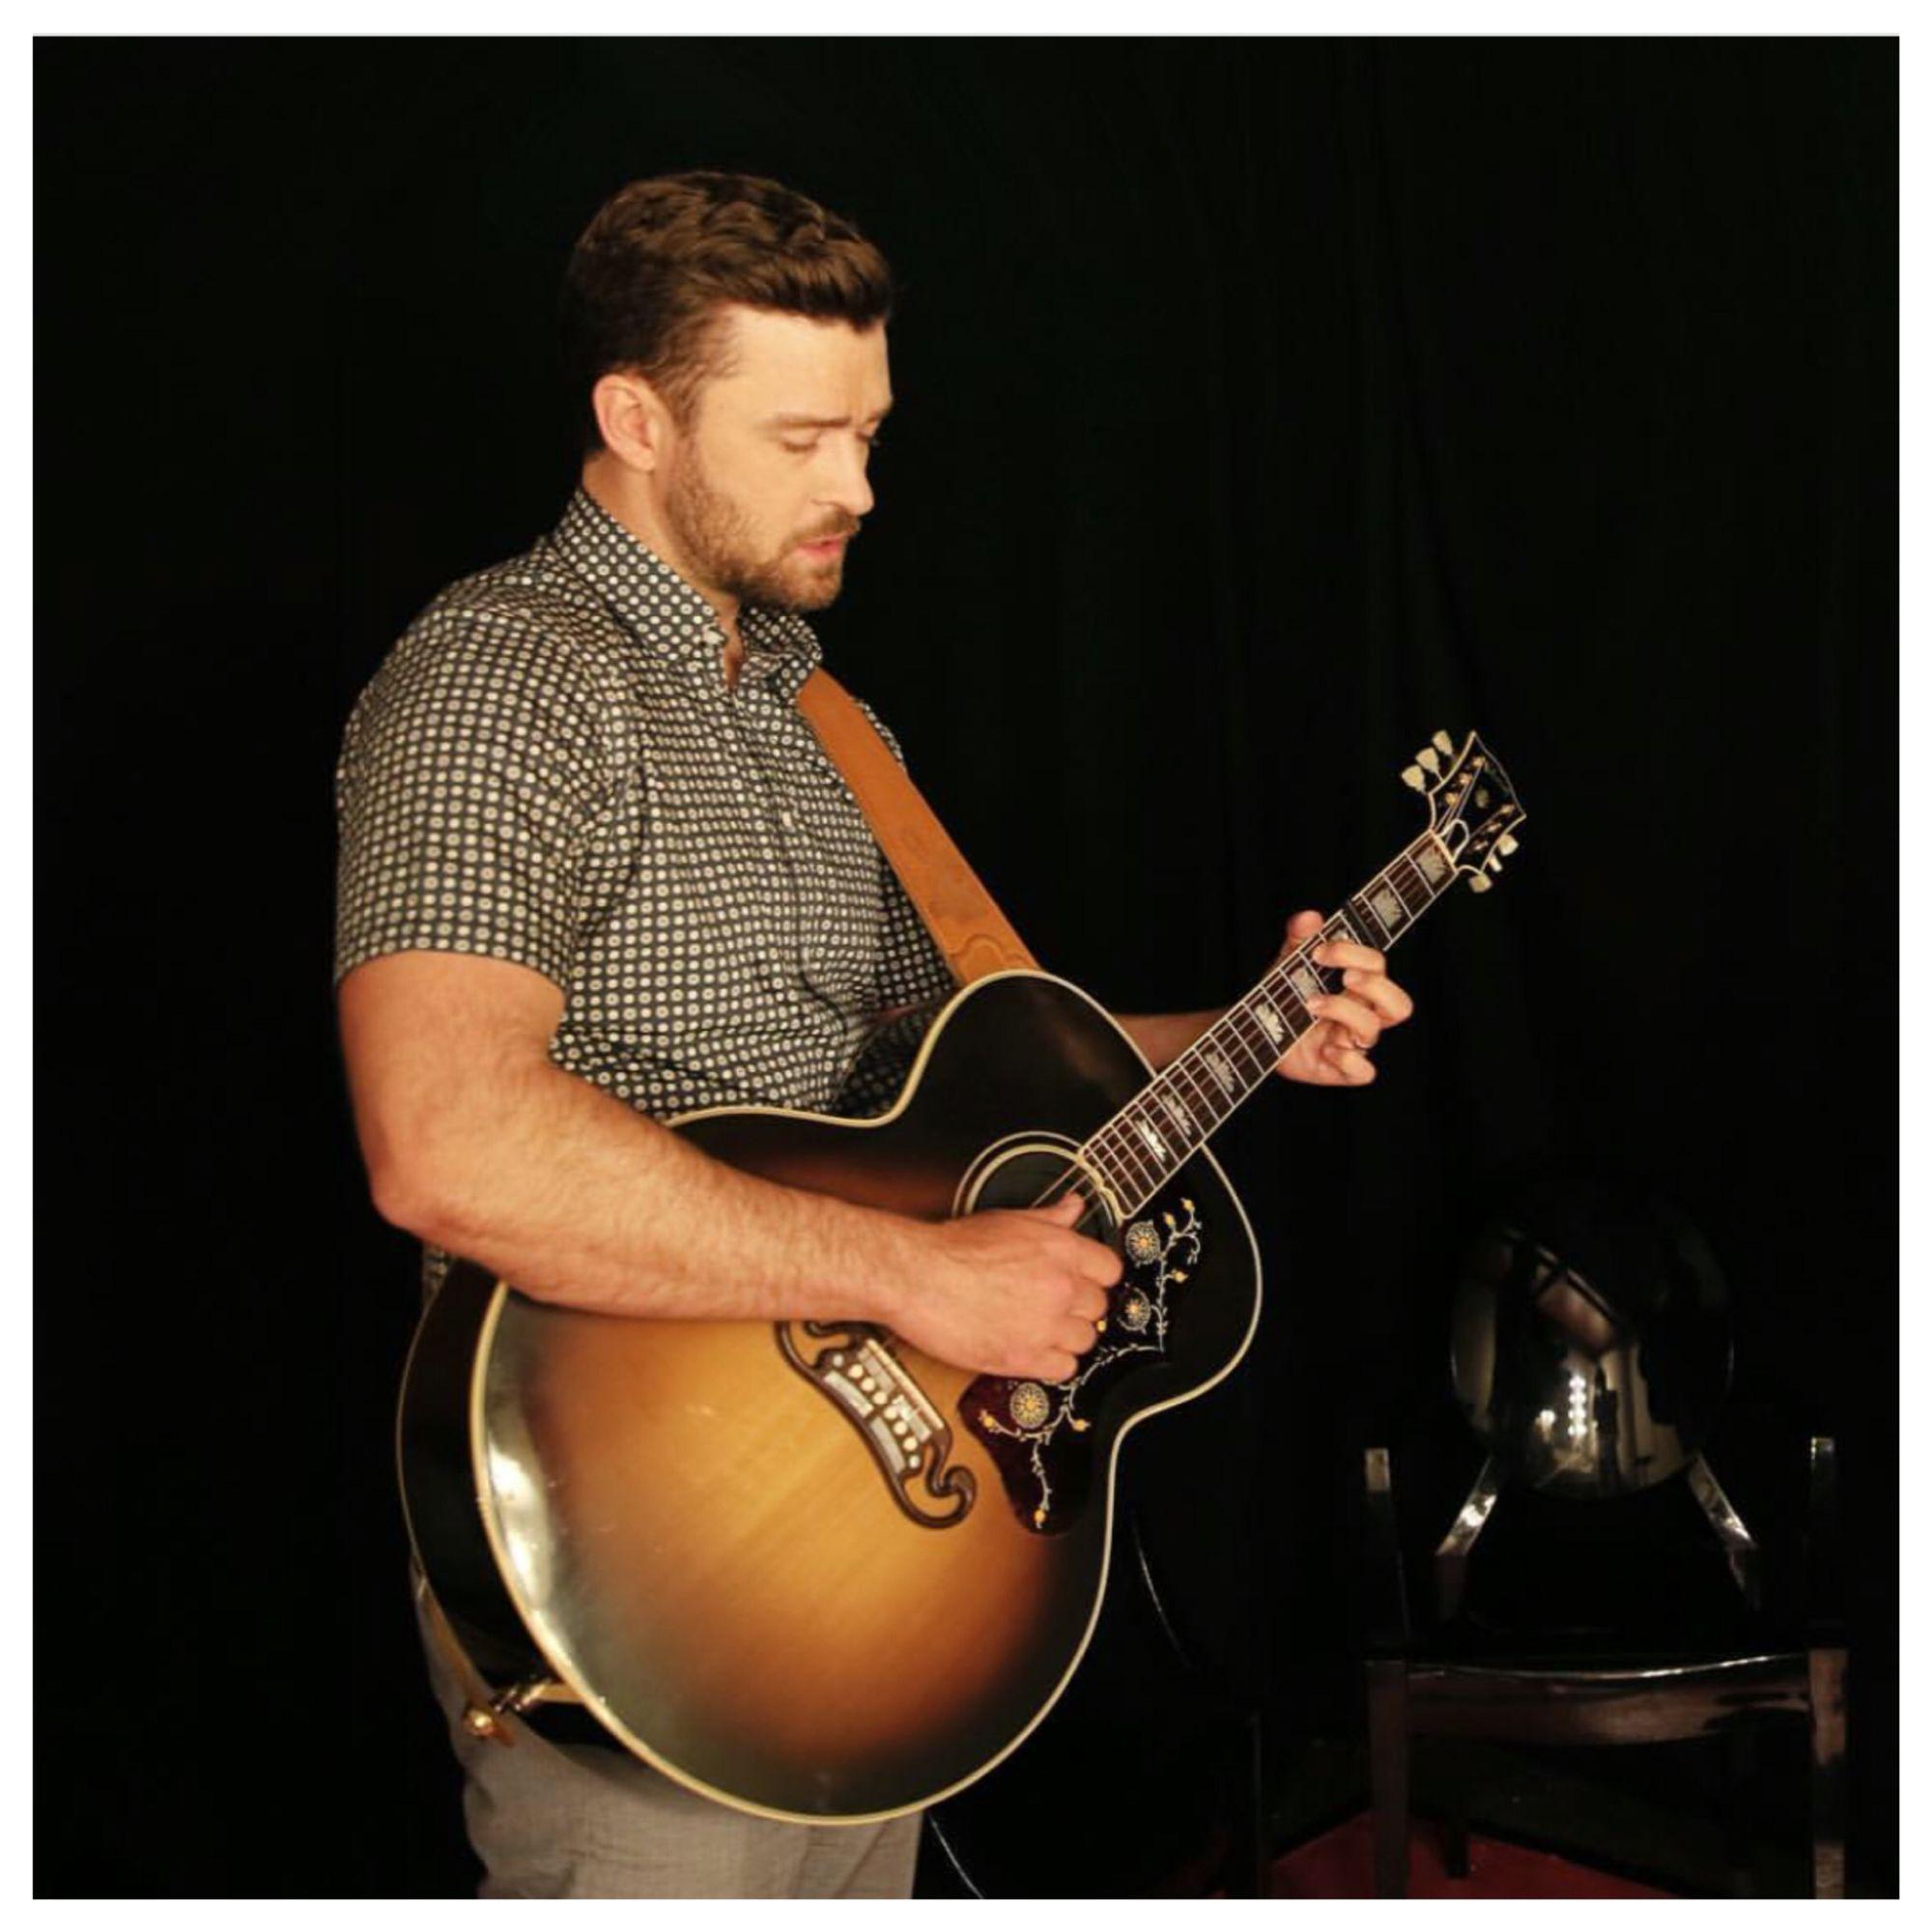 Meghan Mccain Shows Her True Colors: Justin Timberlake